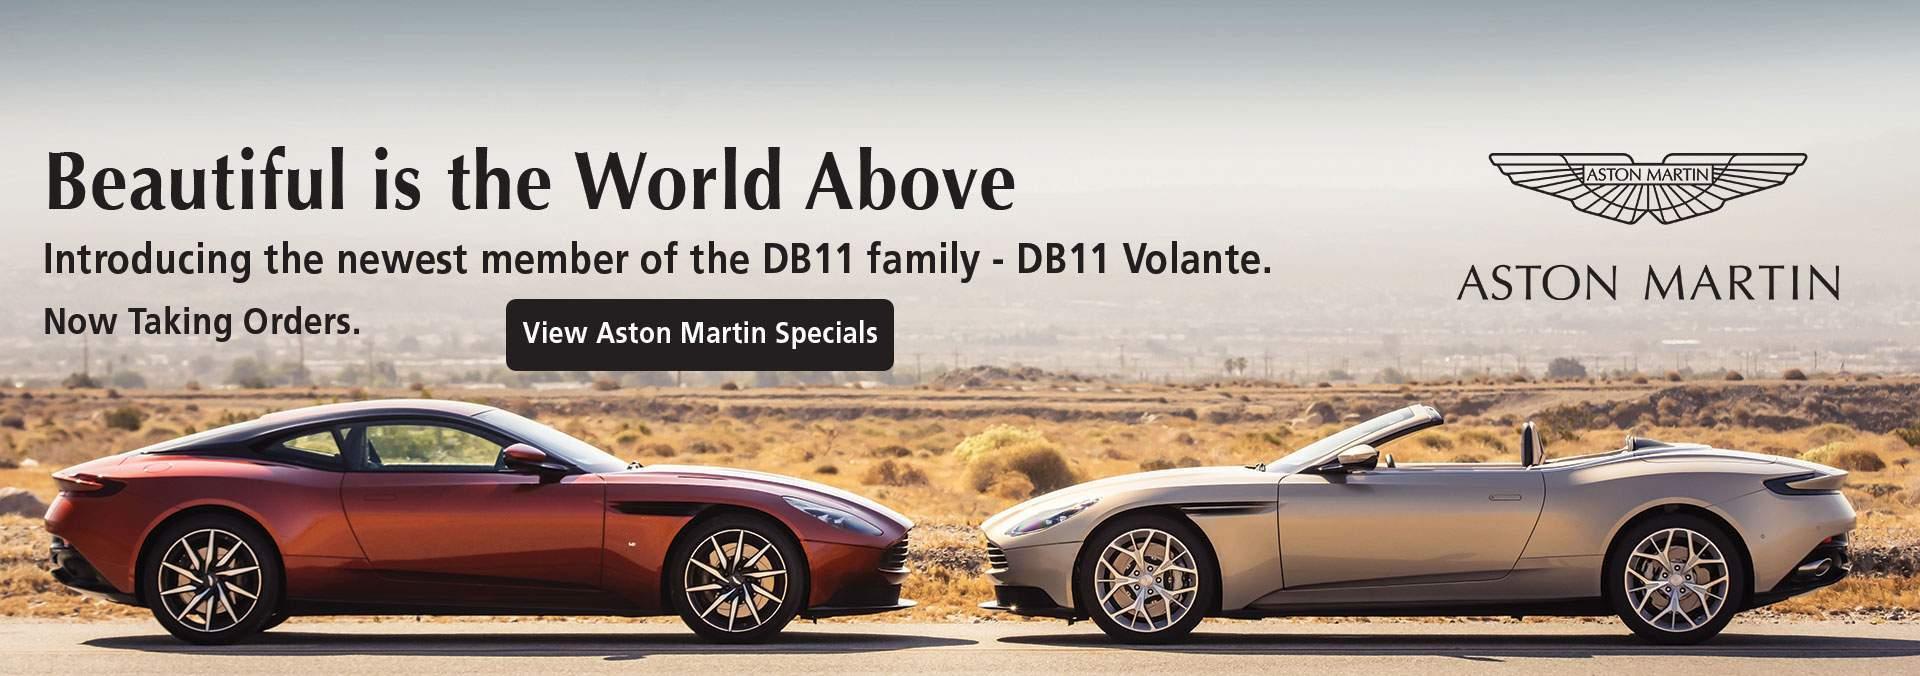 Aston Martin, Ferrari, Maserati, Porsche Dealership Greensboro NC ...